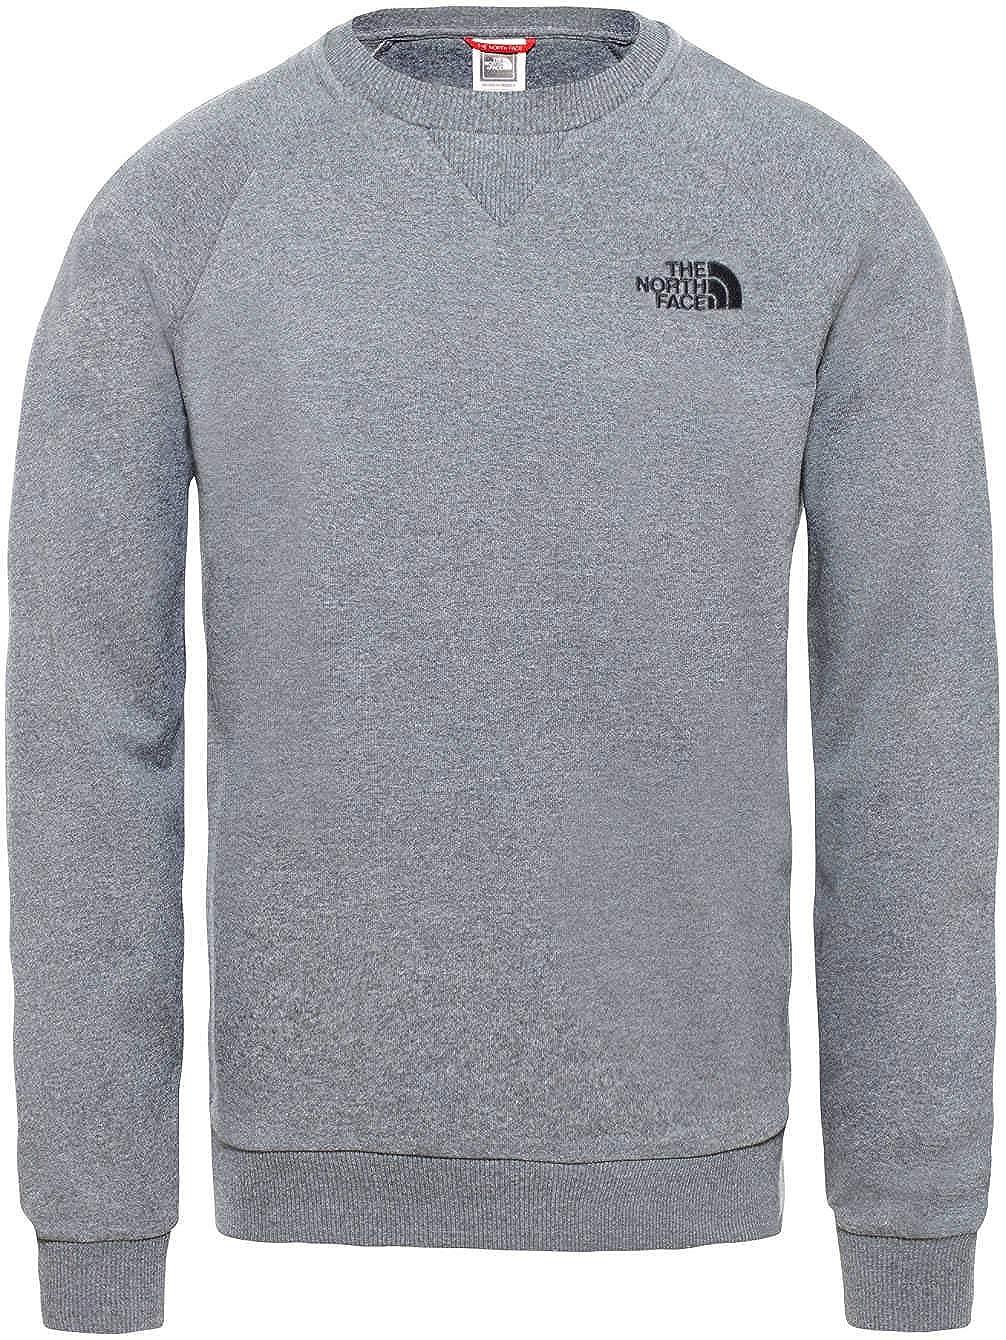 ba8707df3 THE NORTH FACE Men's Raglan Simple Dome Long Sleeve T-Shirt